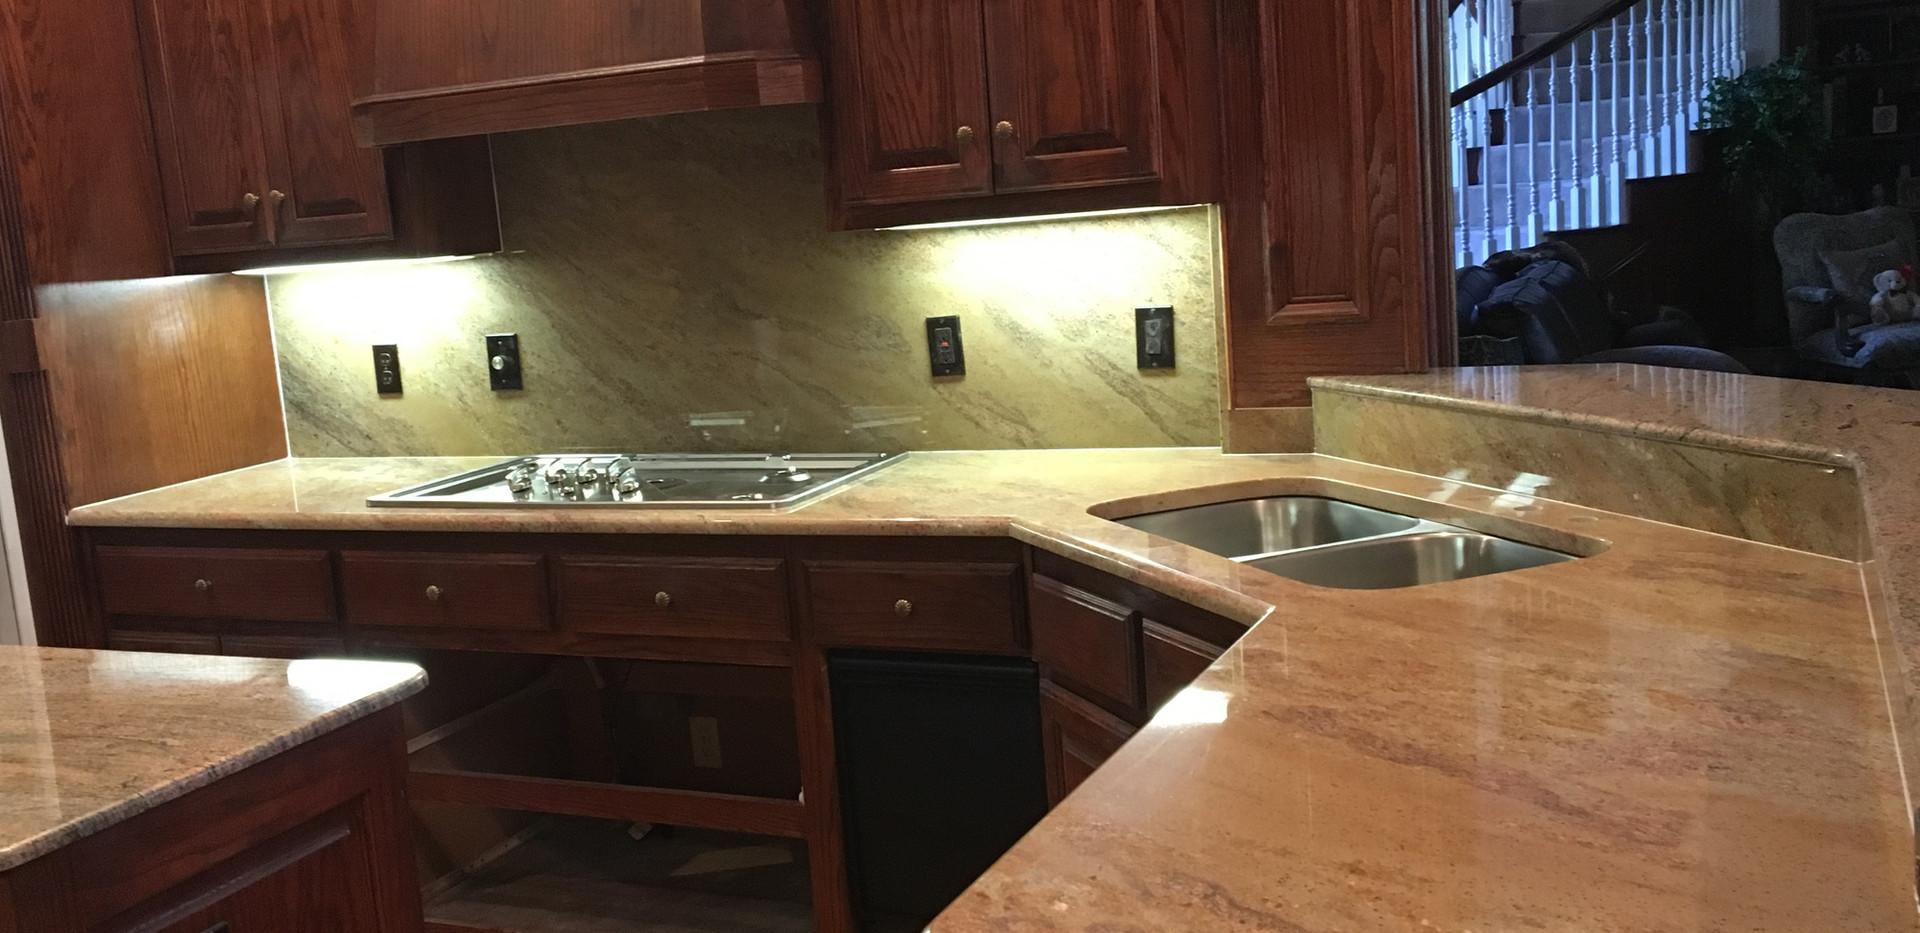 tan_granite_kitchen_countertops.jpg